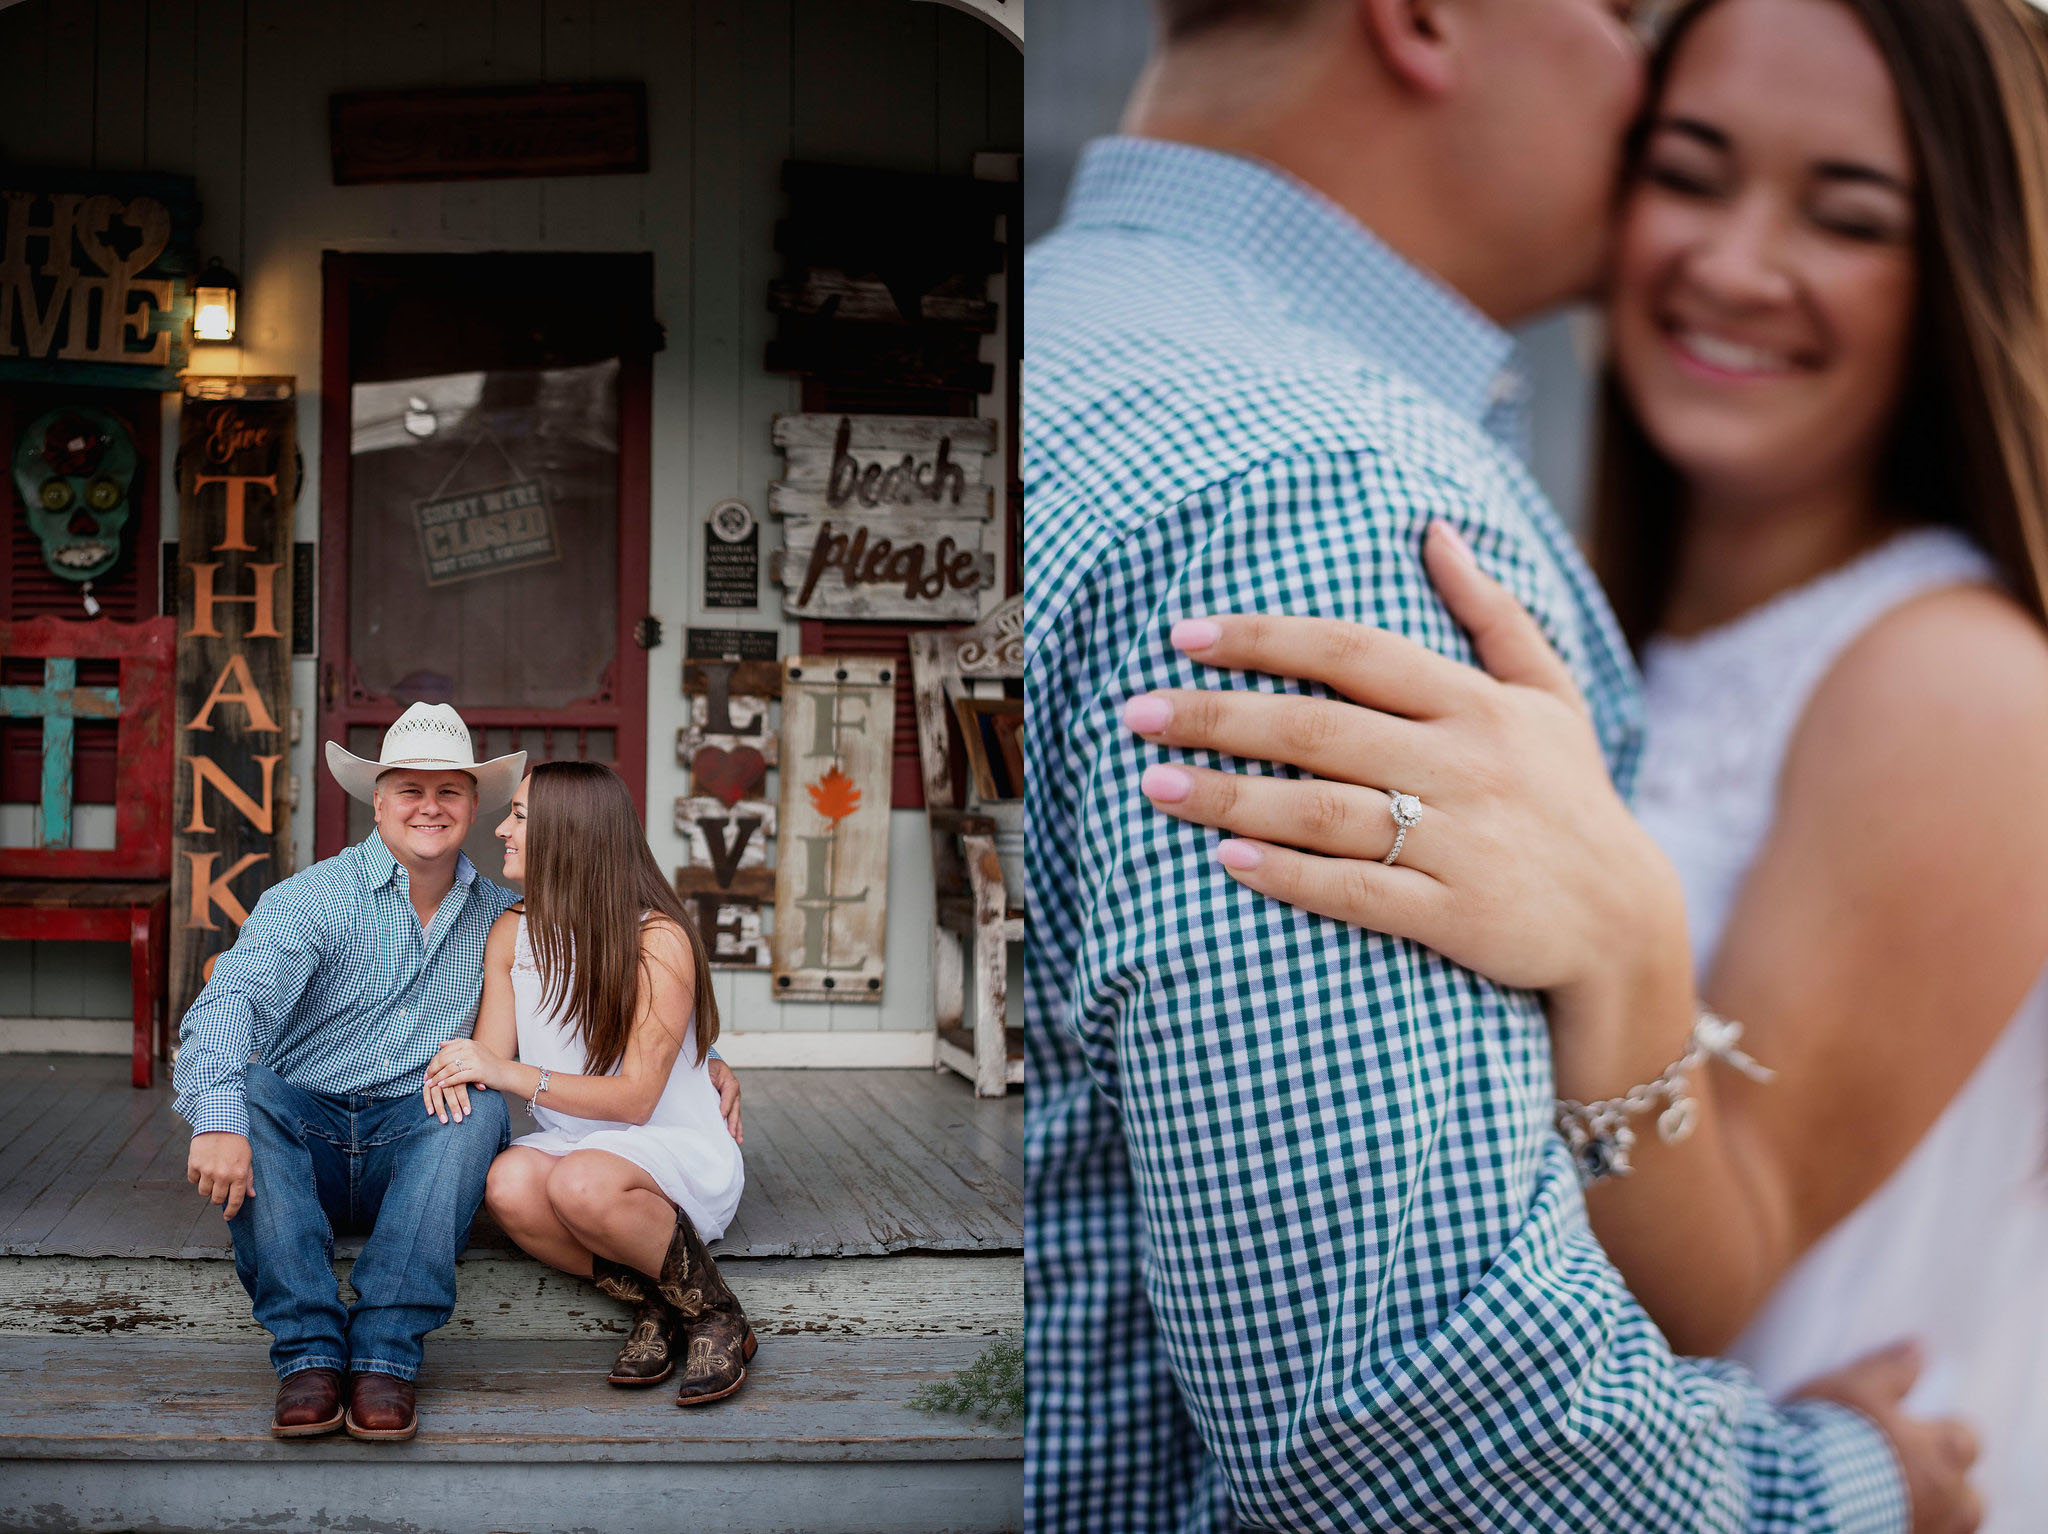 EffJay Photography Gruene TX Engagement Session Destination Wedding Photographer001 copy.jpg